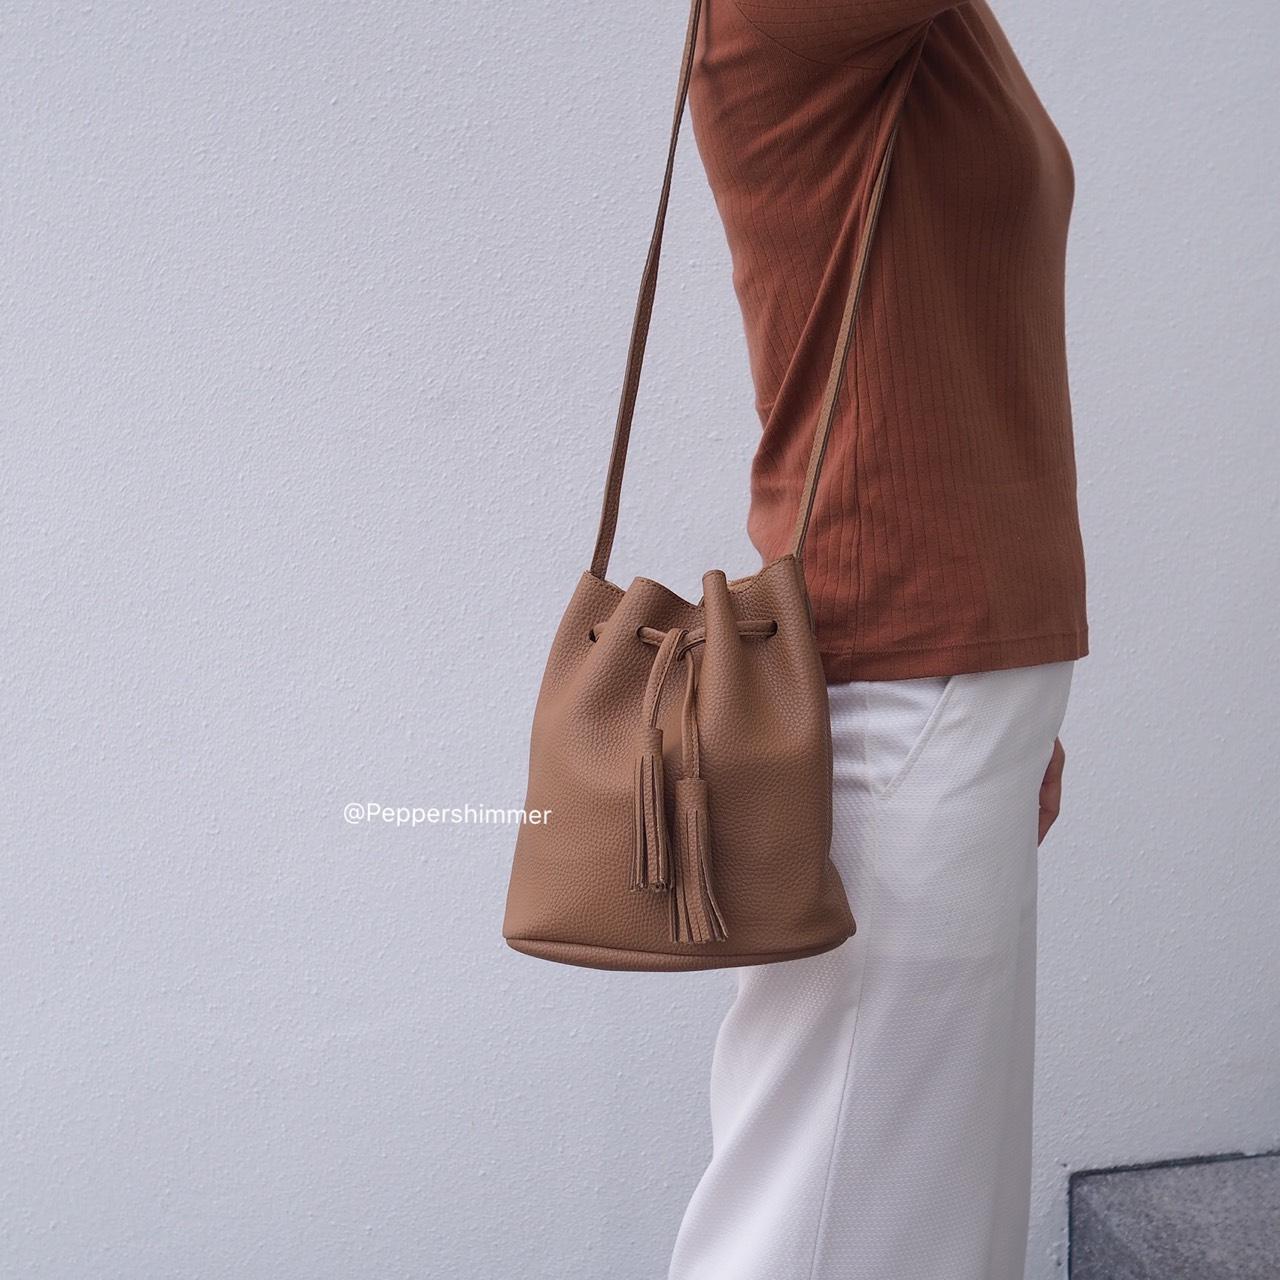 PEPPERSHIMMER,bag,กระเป๋า,กระเป๋าสะพาย,กระเป๋าผู้หญิง